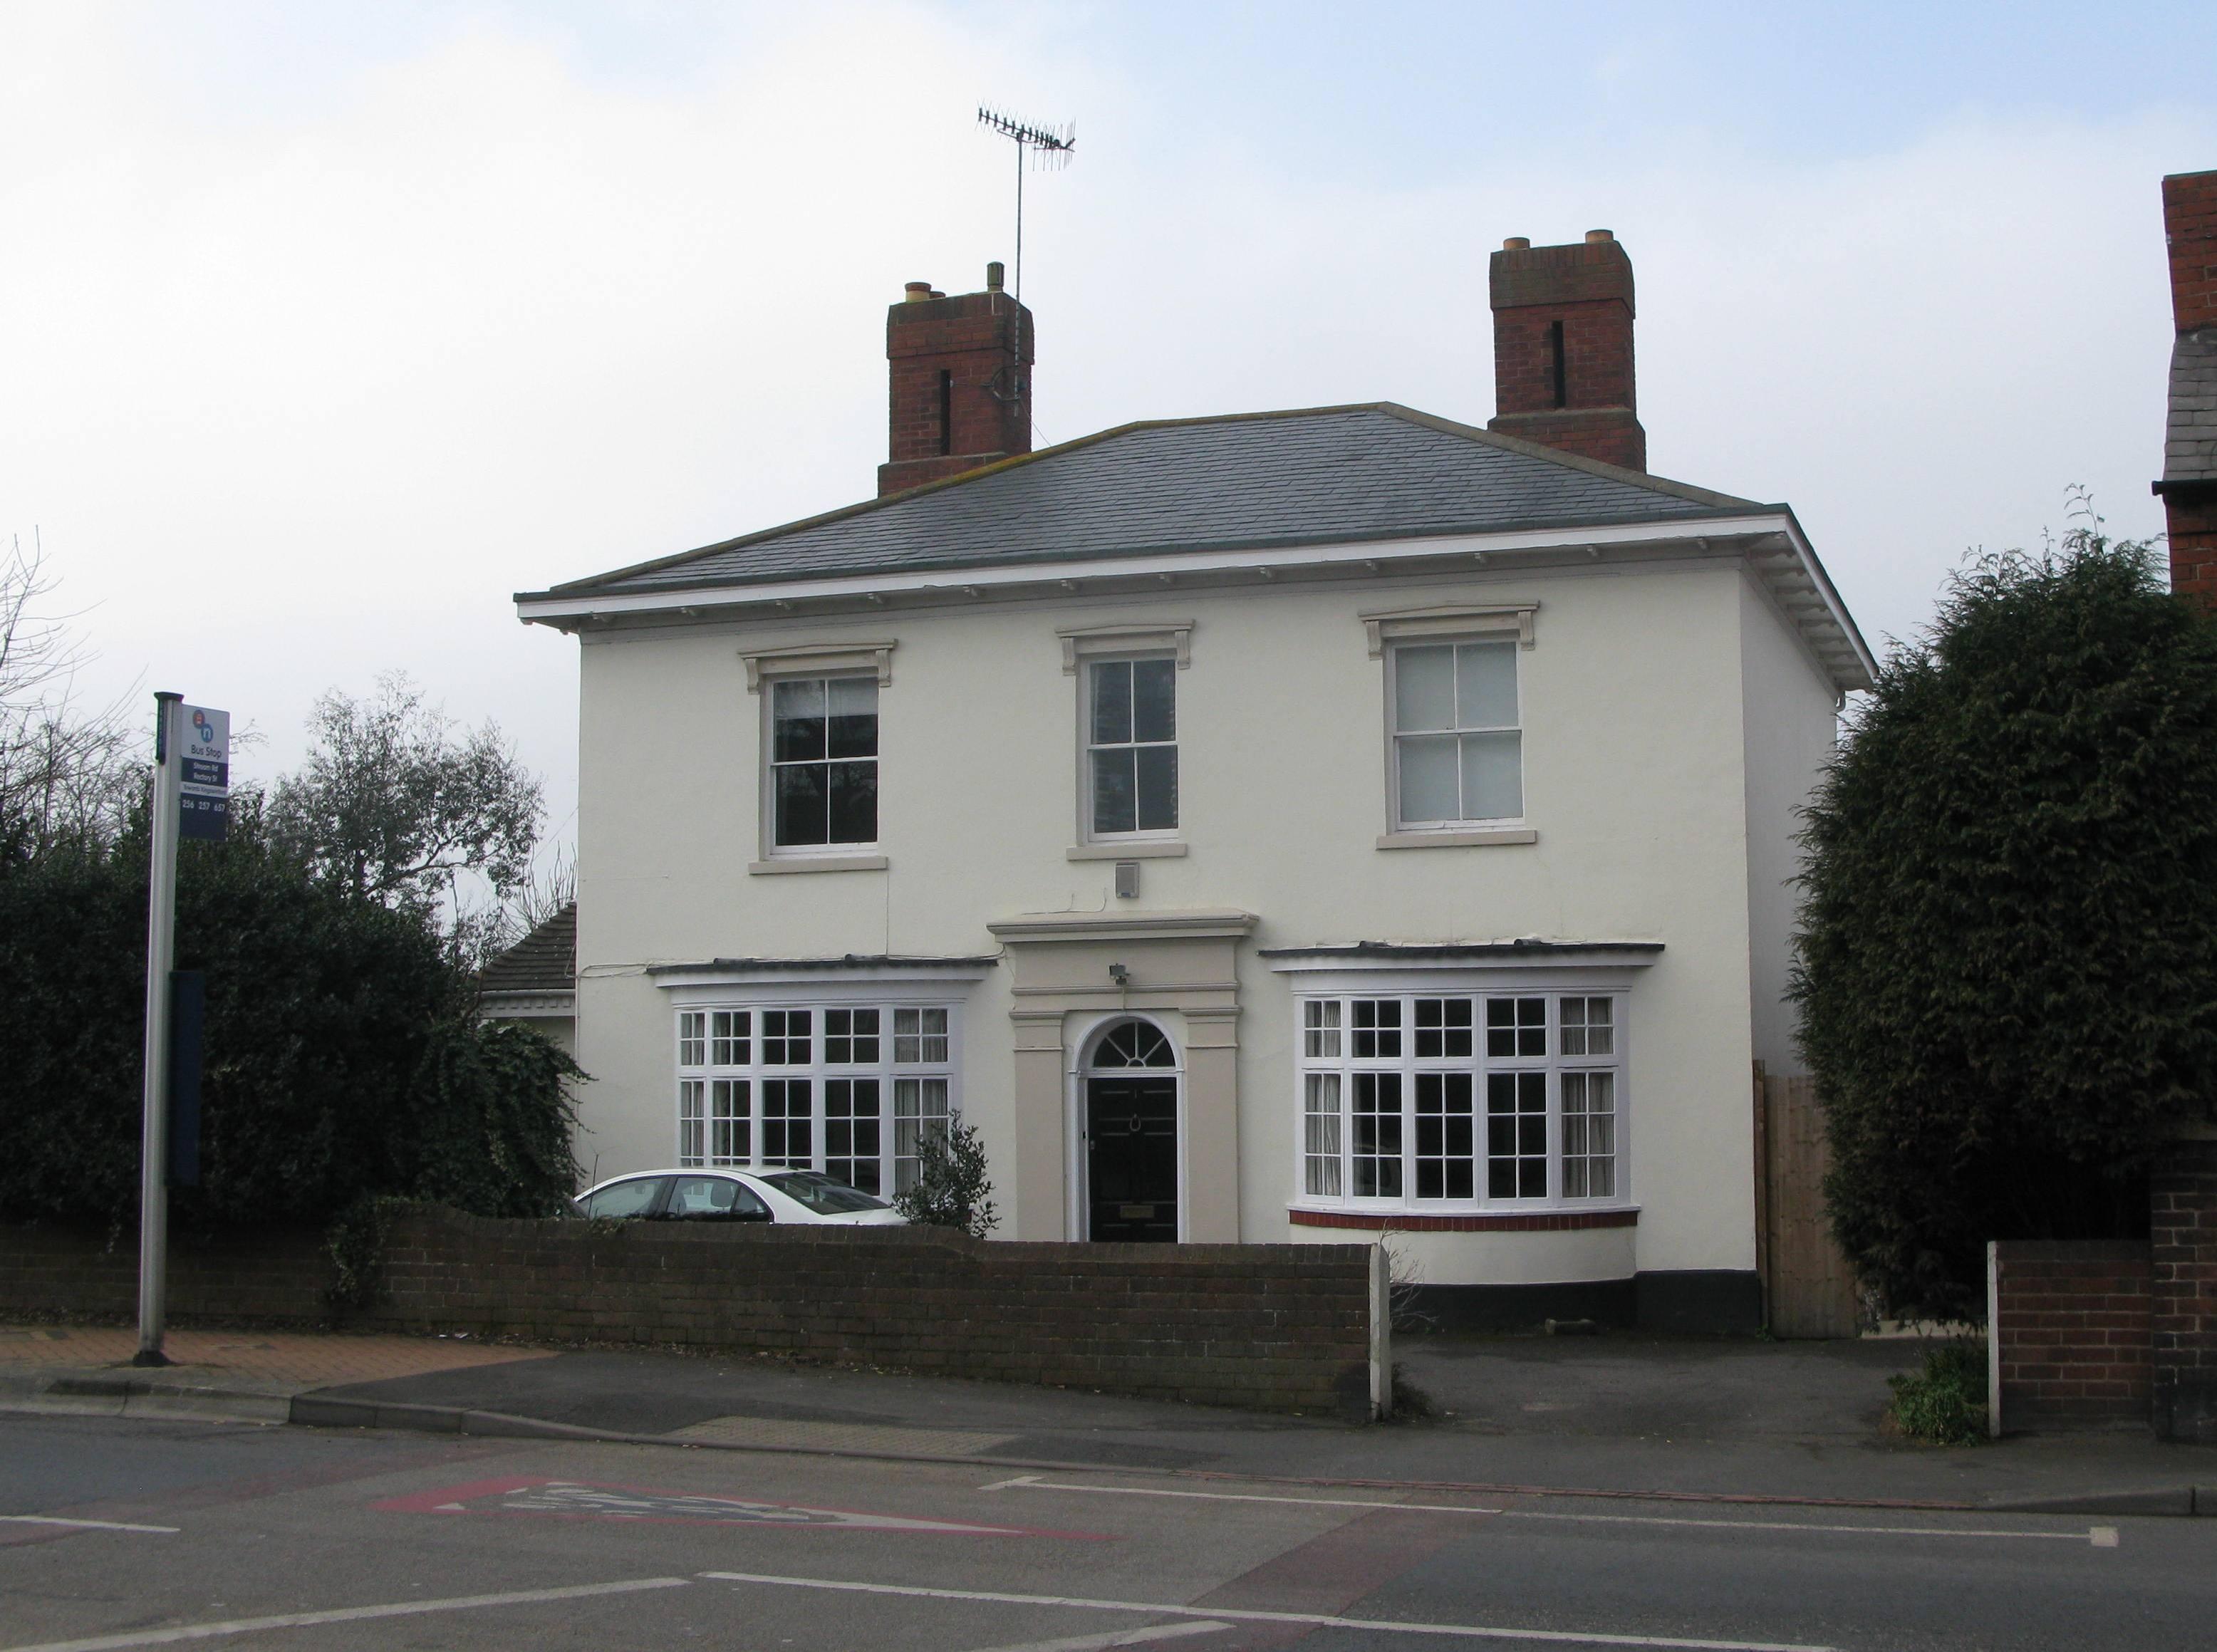 File:Wordsley The White Lodge.JPG